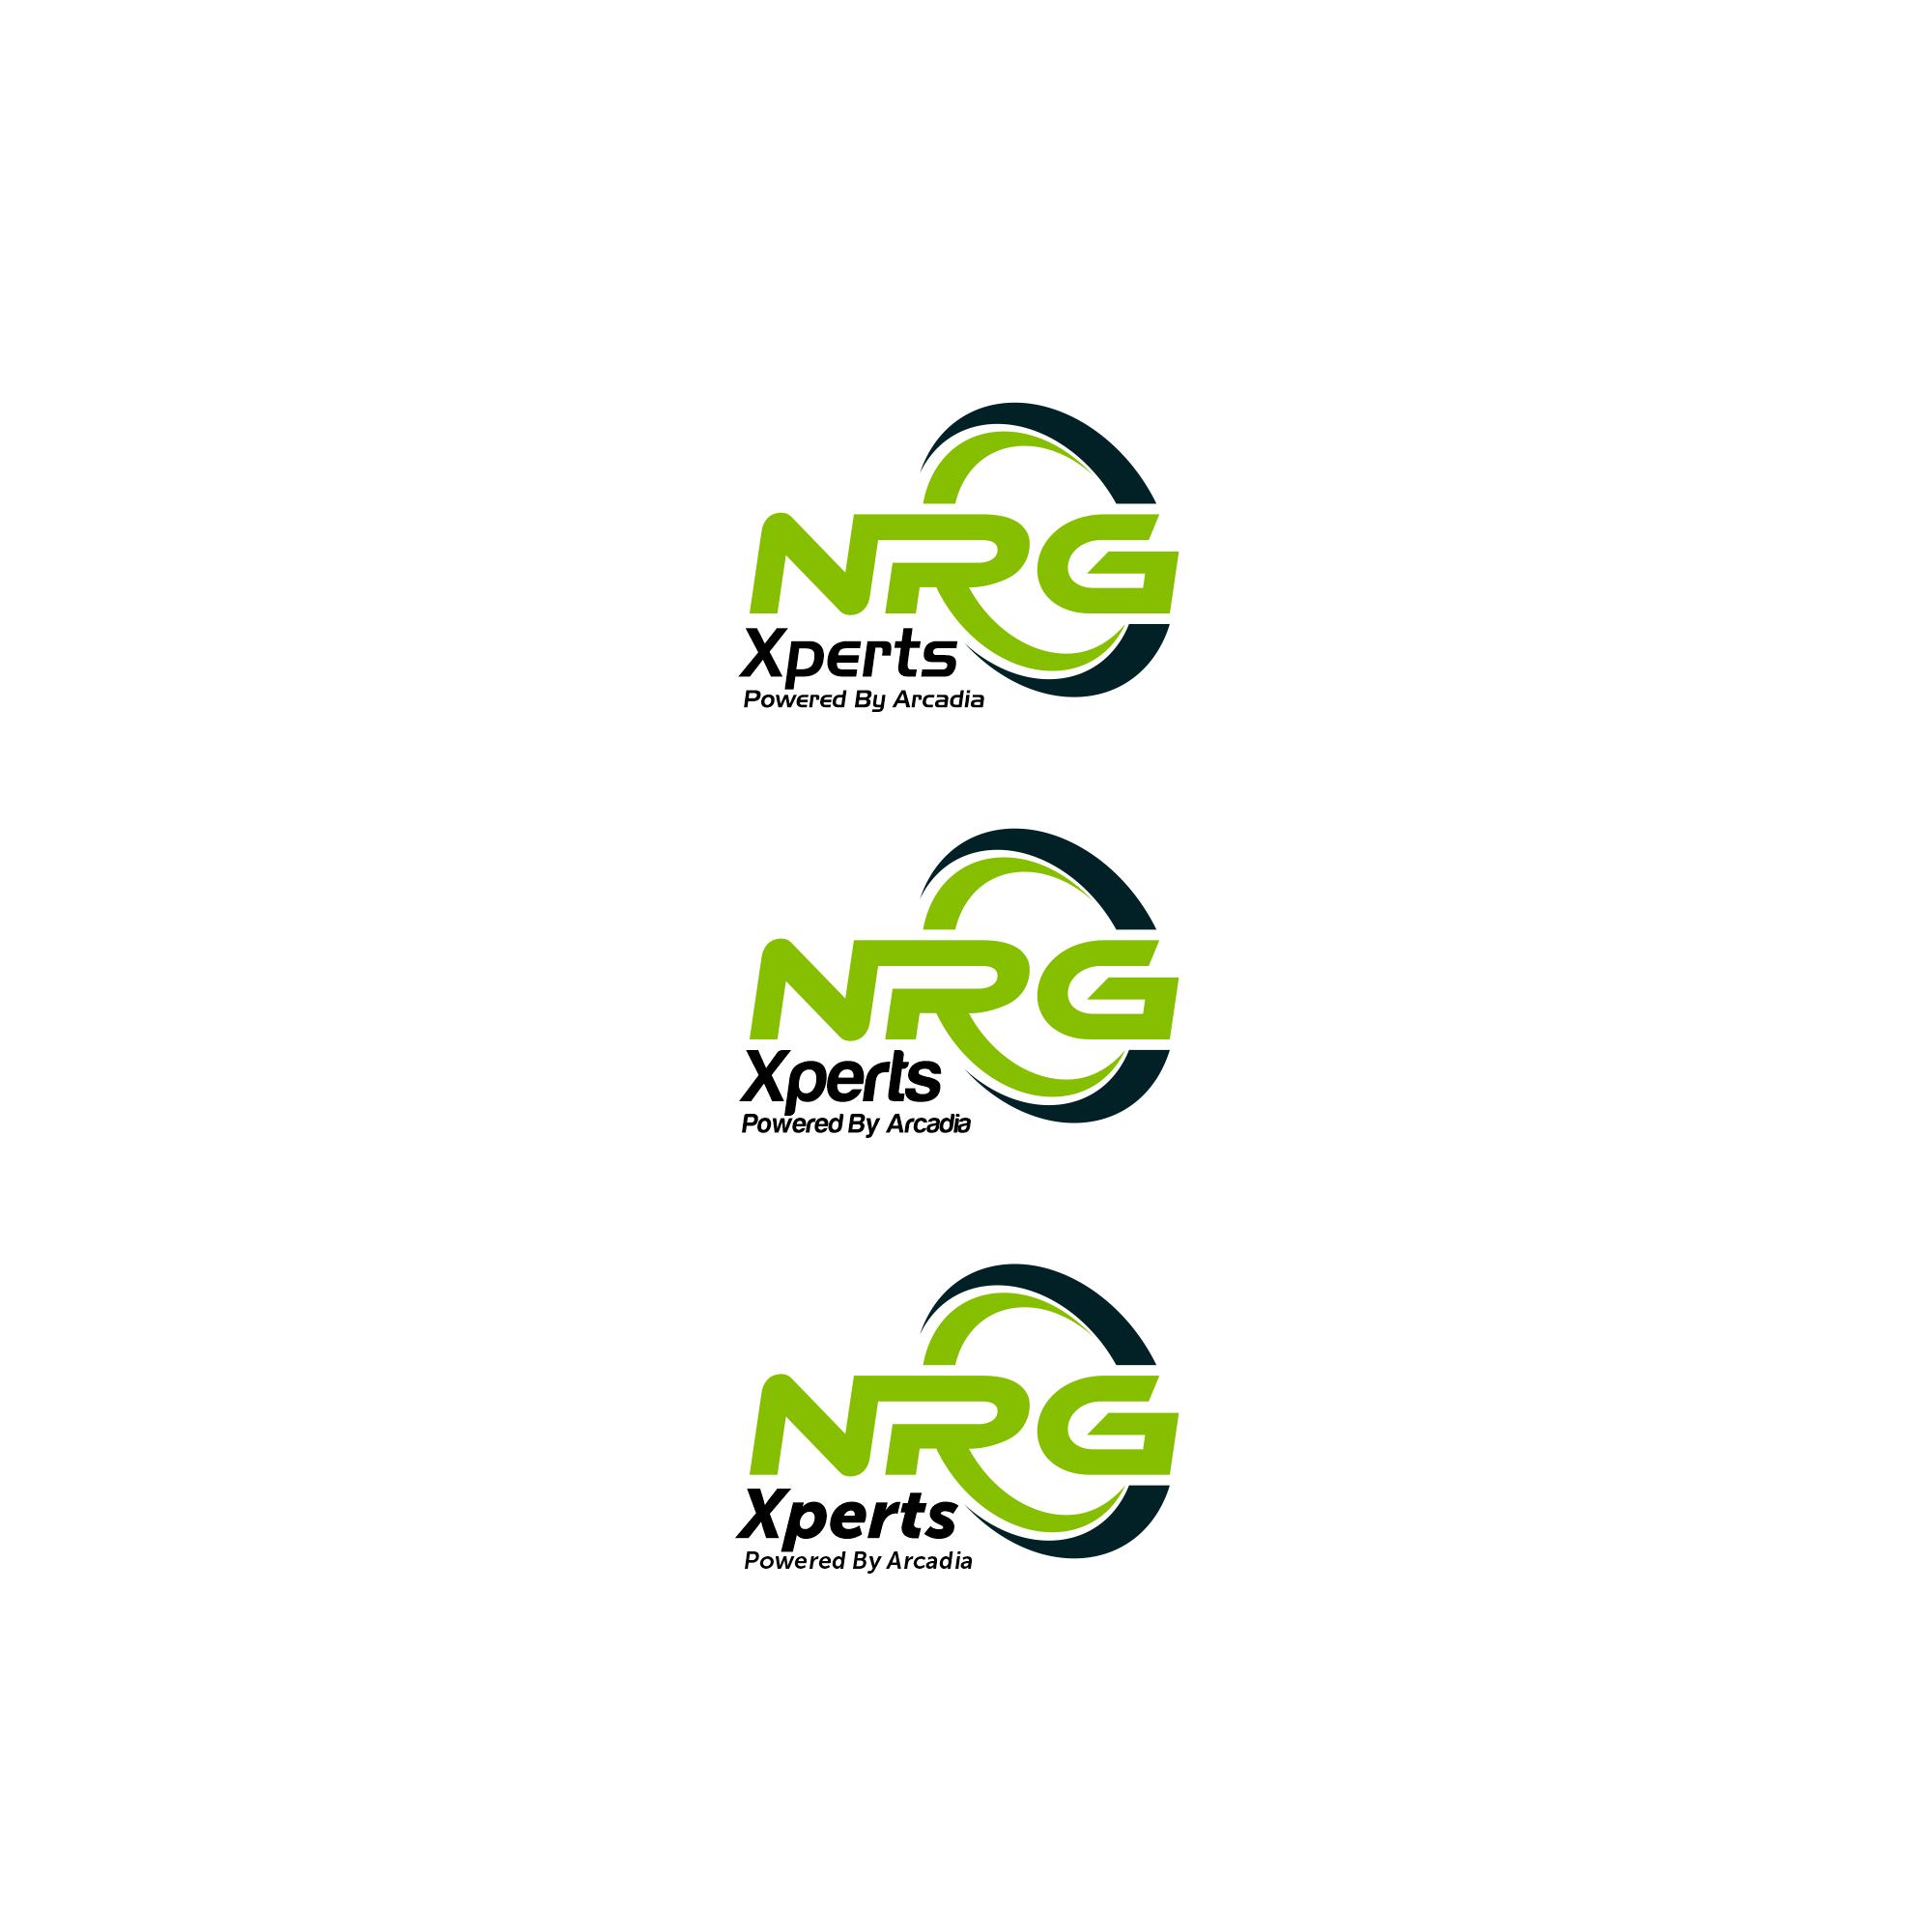 NRG Xperts